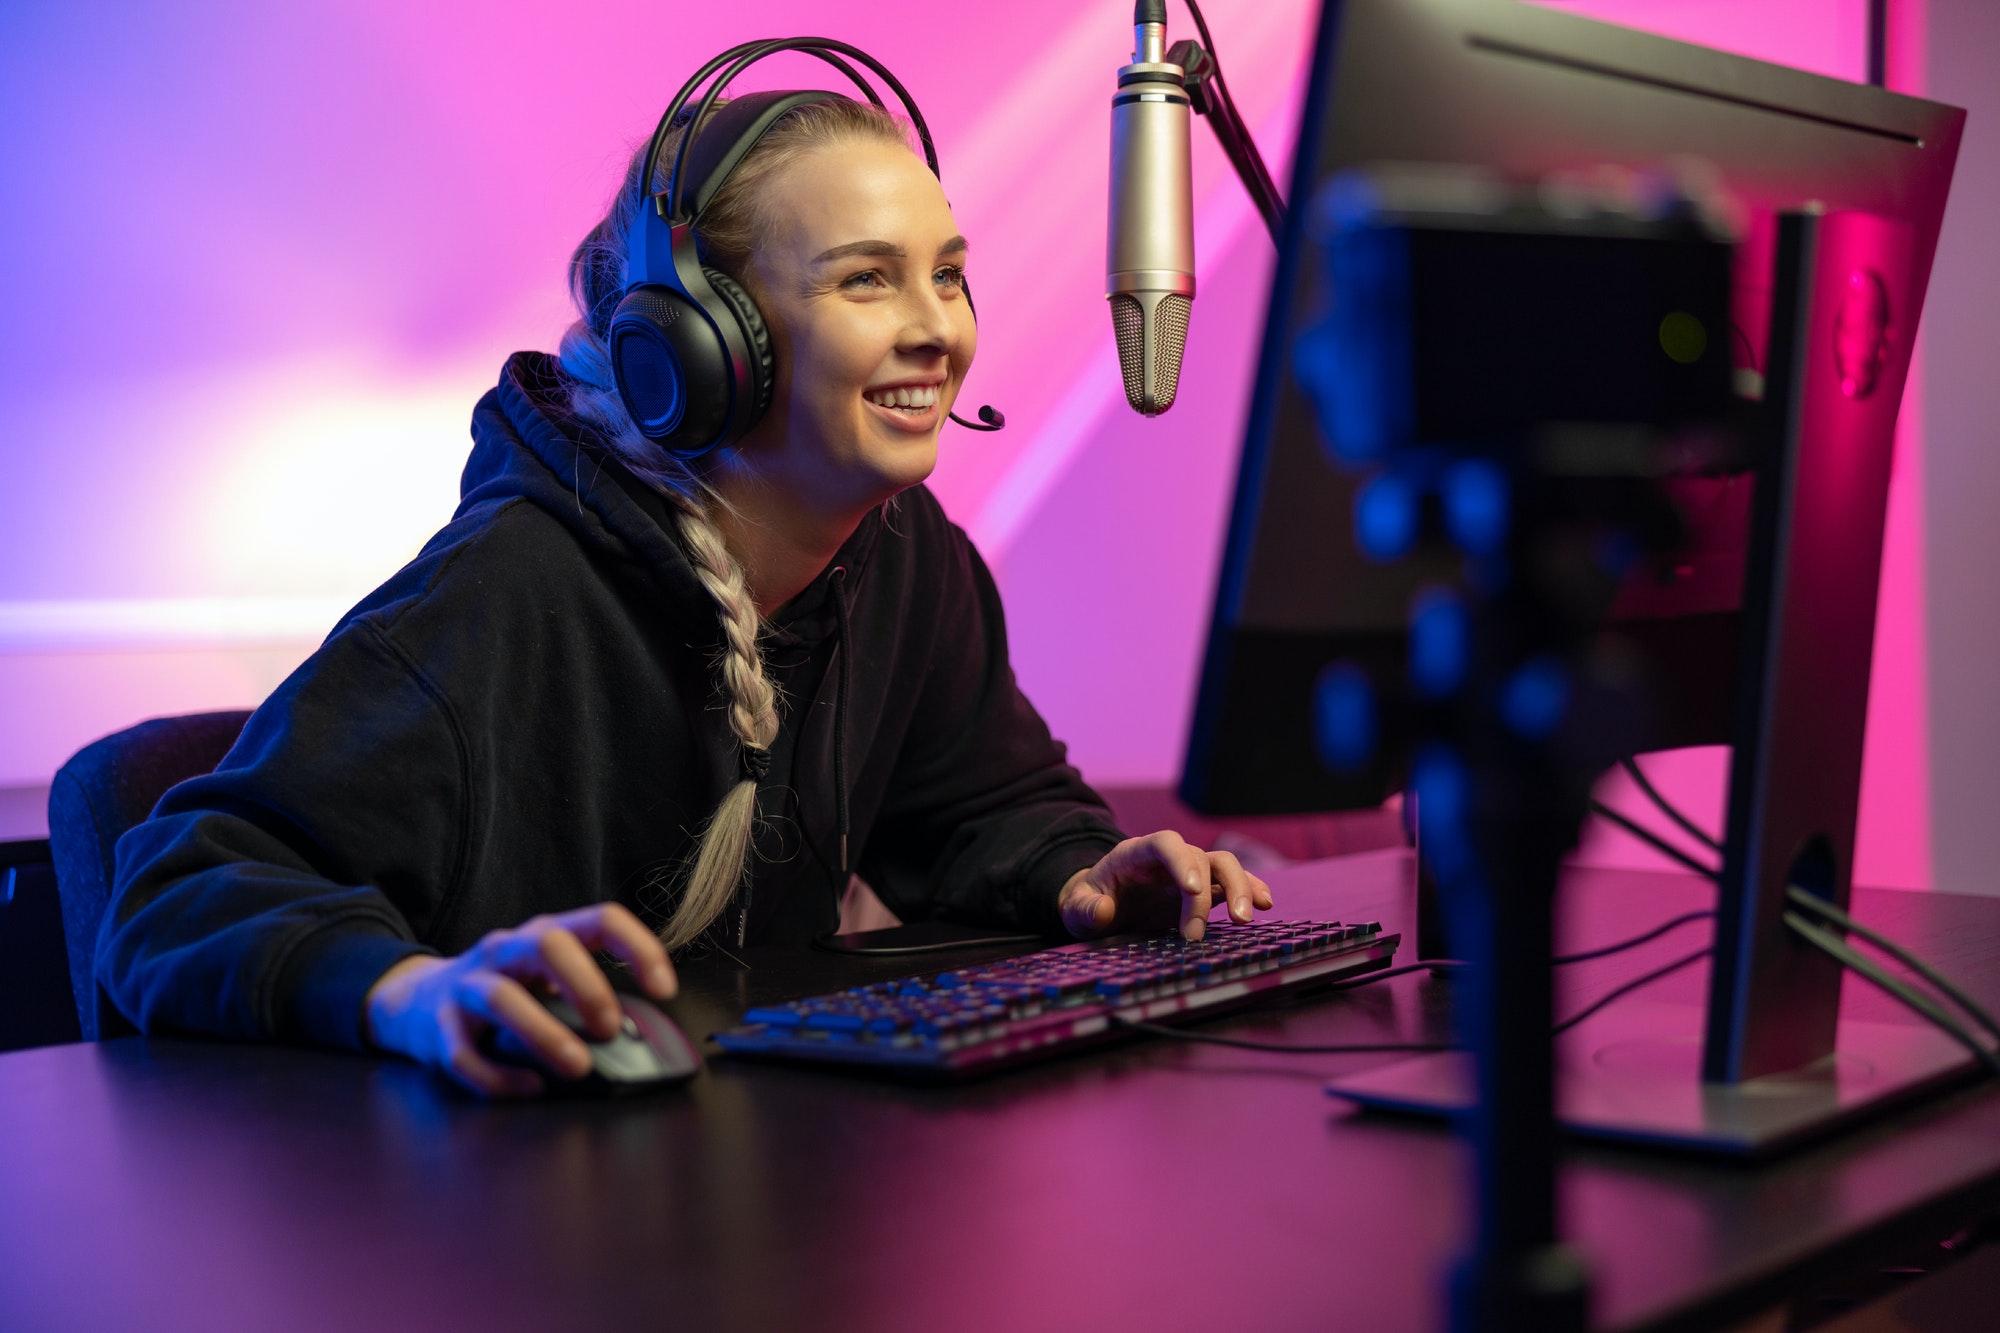 Professional smiling esport gamer girl live streaming eyeware beam